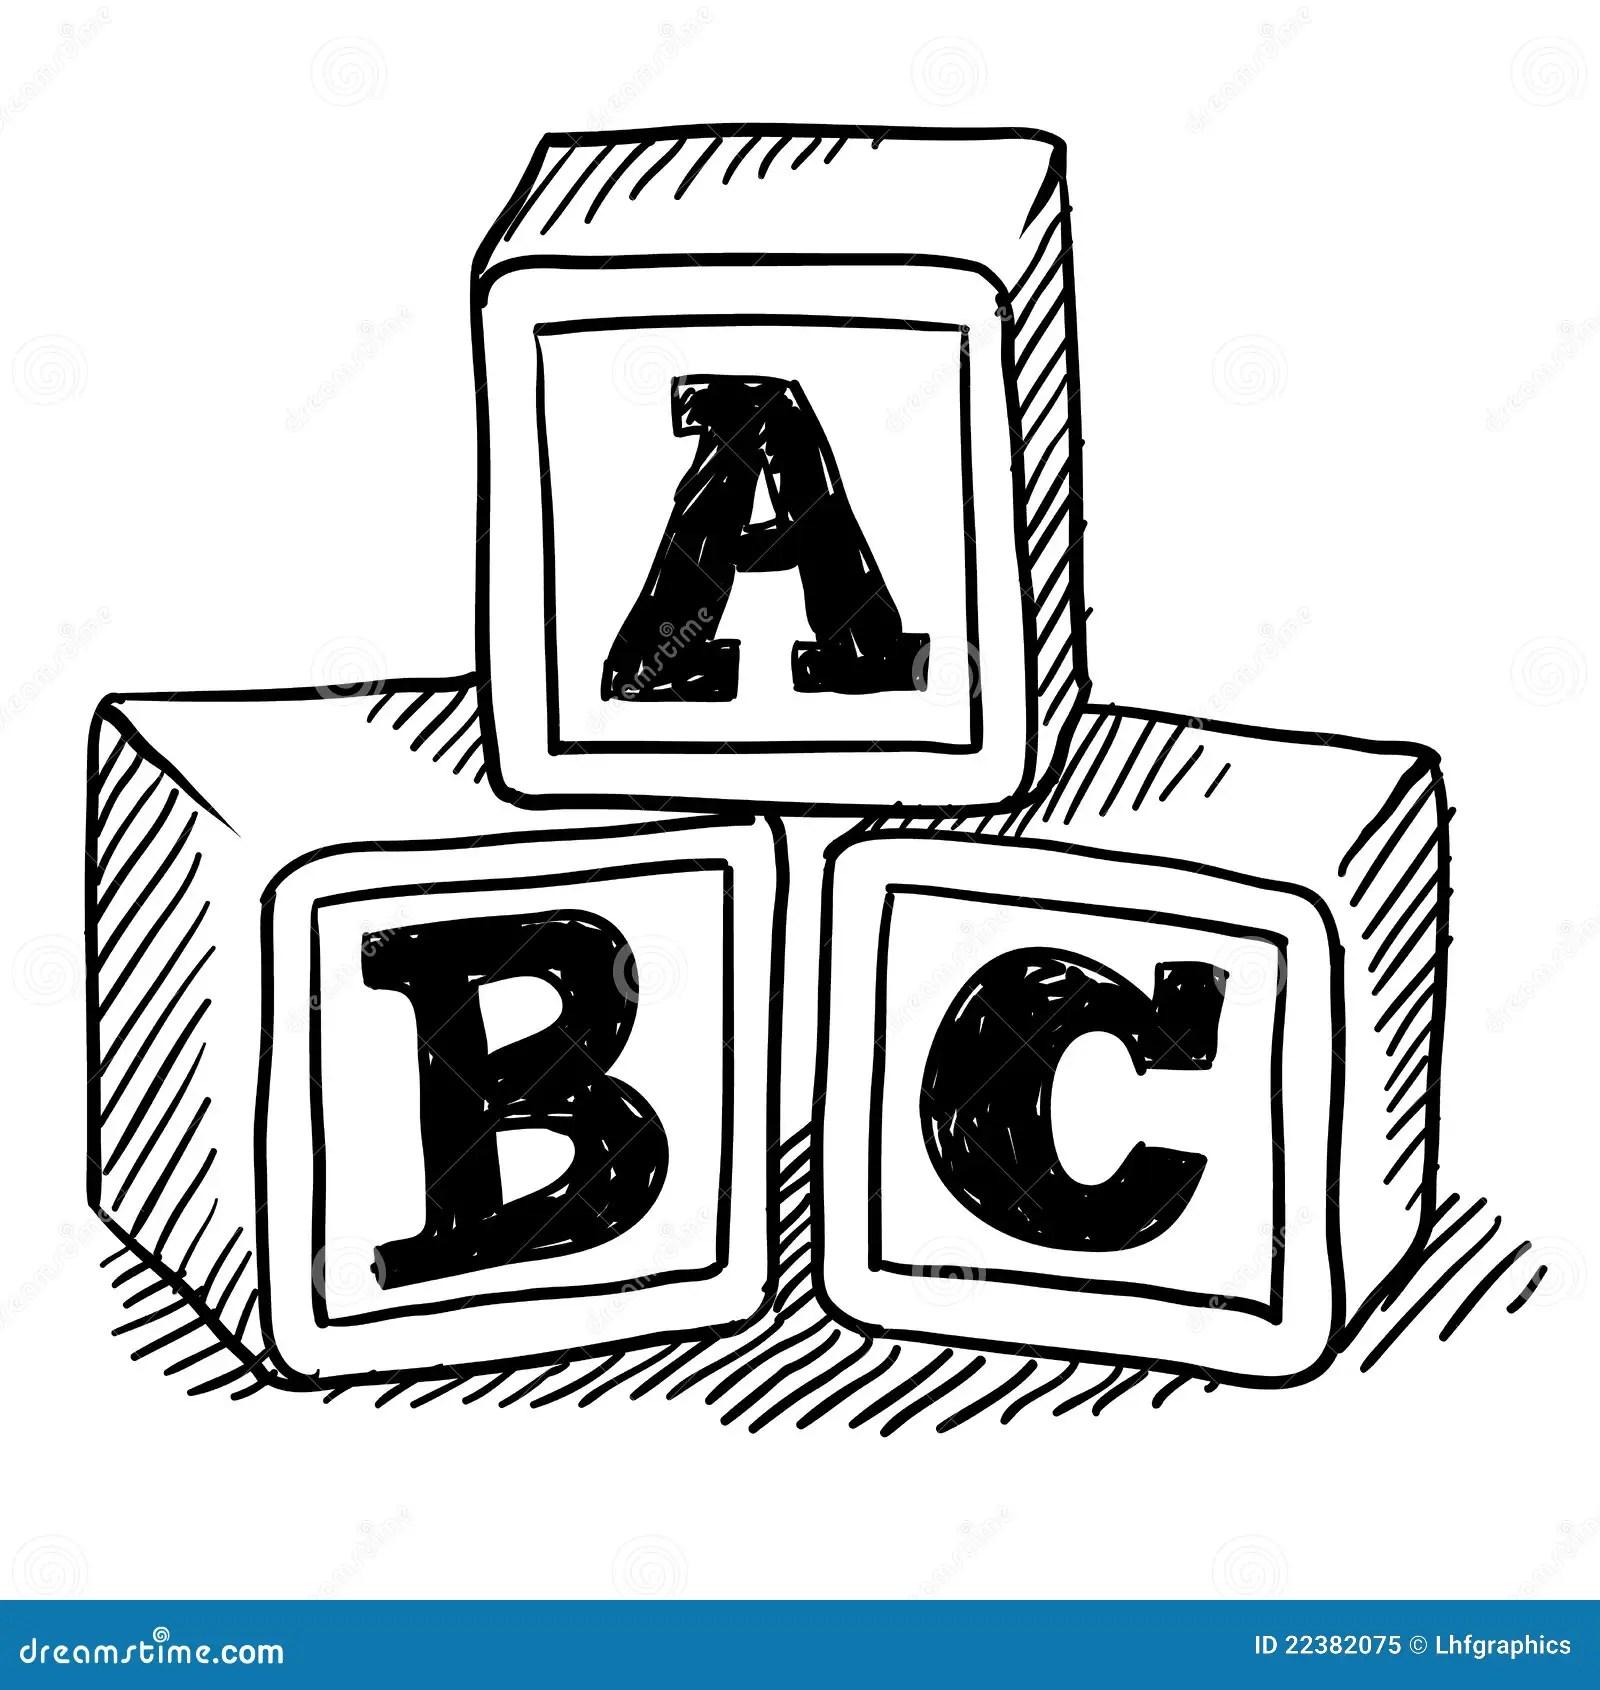 ABC blocks sketch stock vector. Illustration of drawing